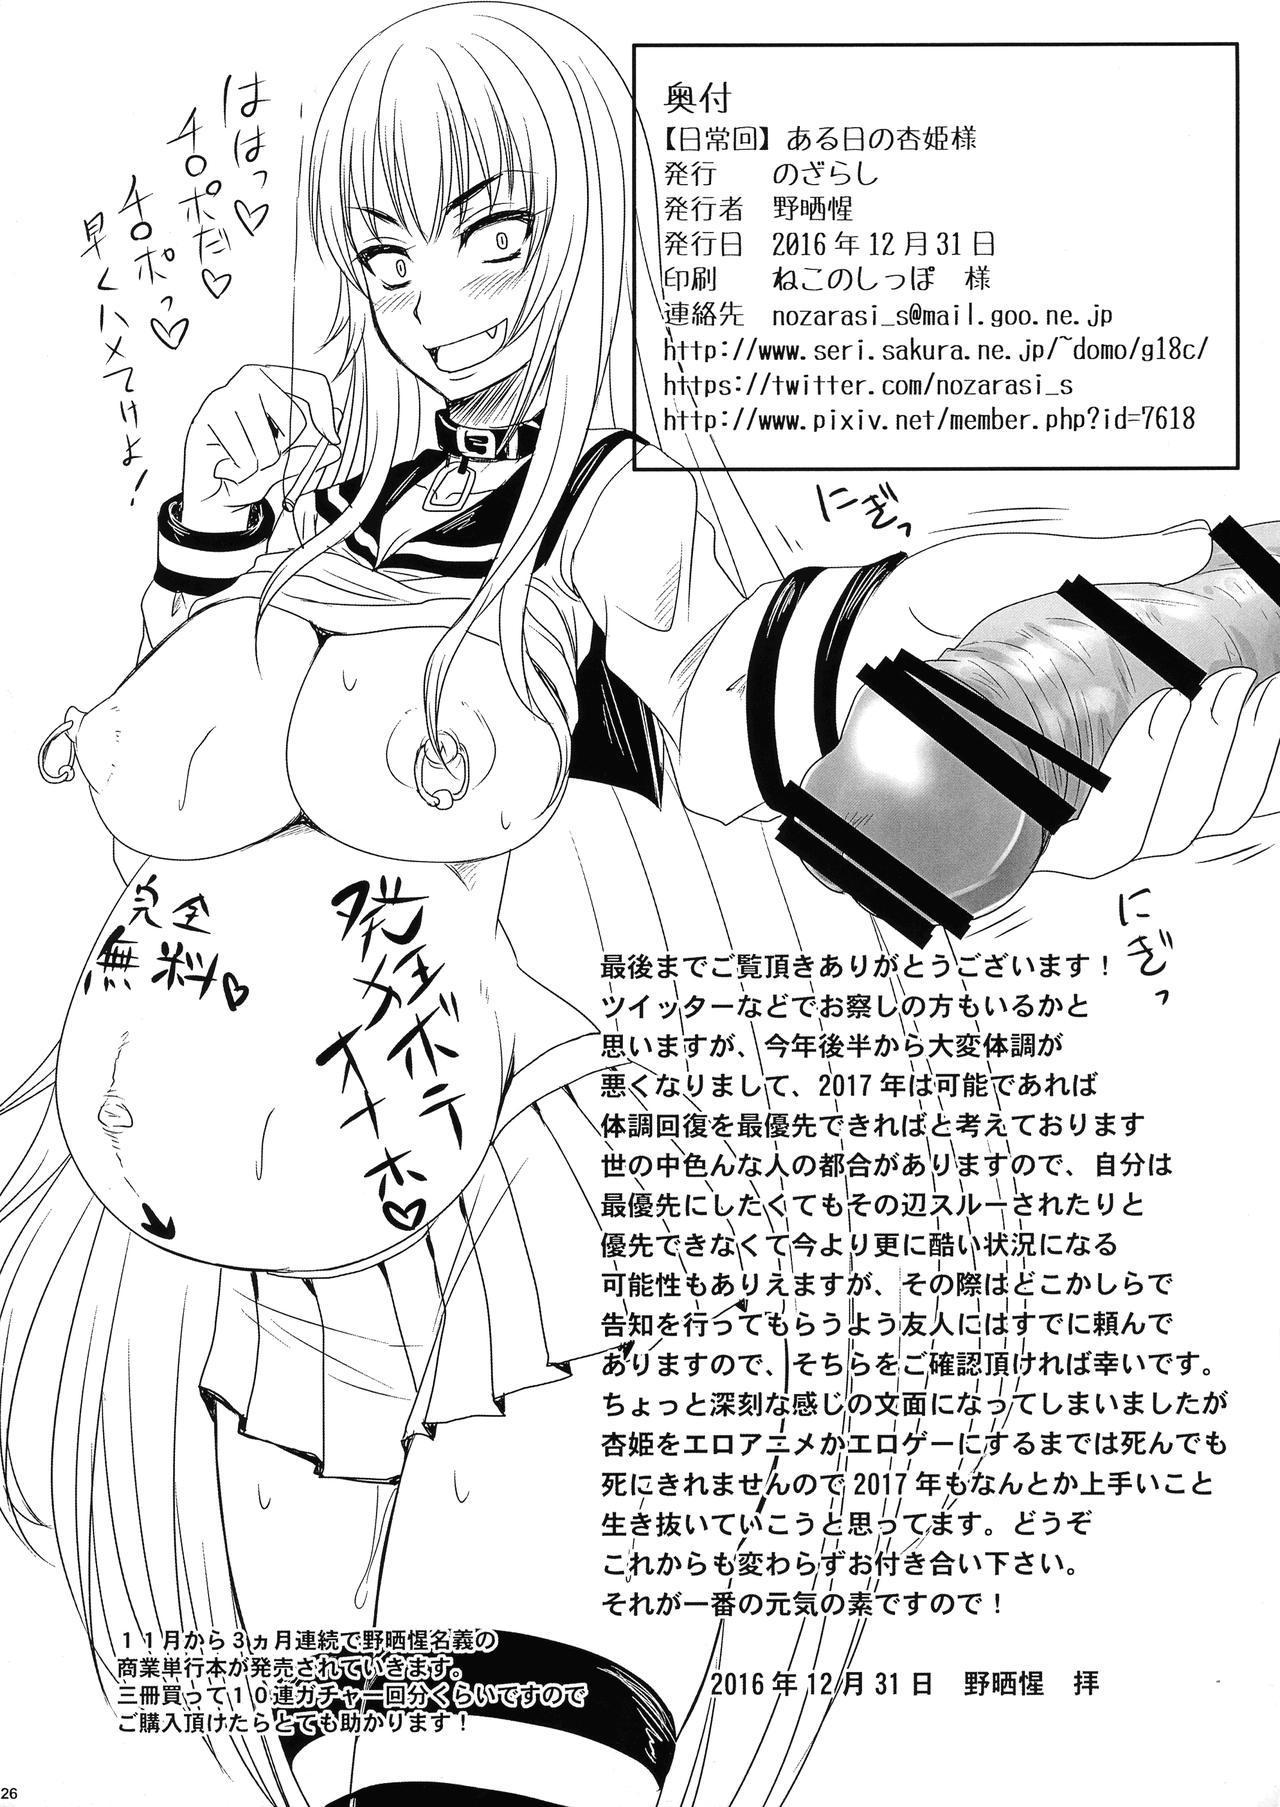 Aruhi no Kyouhime 27